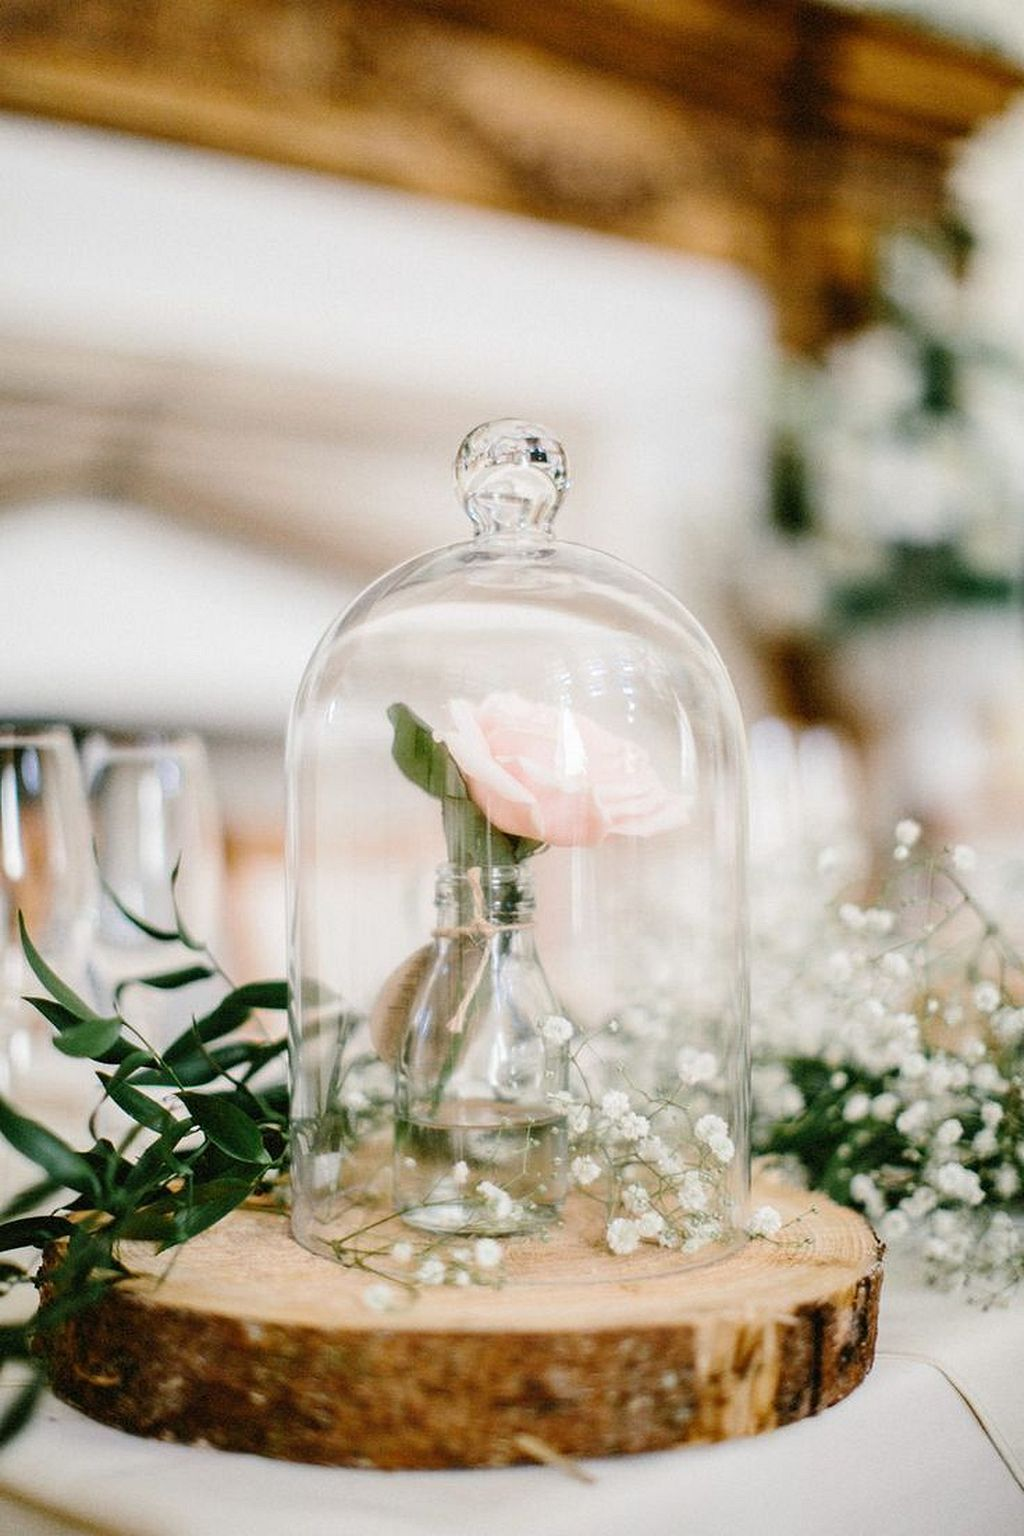 30+ Fabulous Disney Wedding Centerpieces | Pinterest | Disney ...